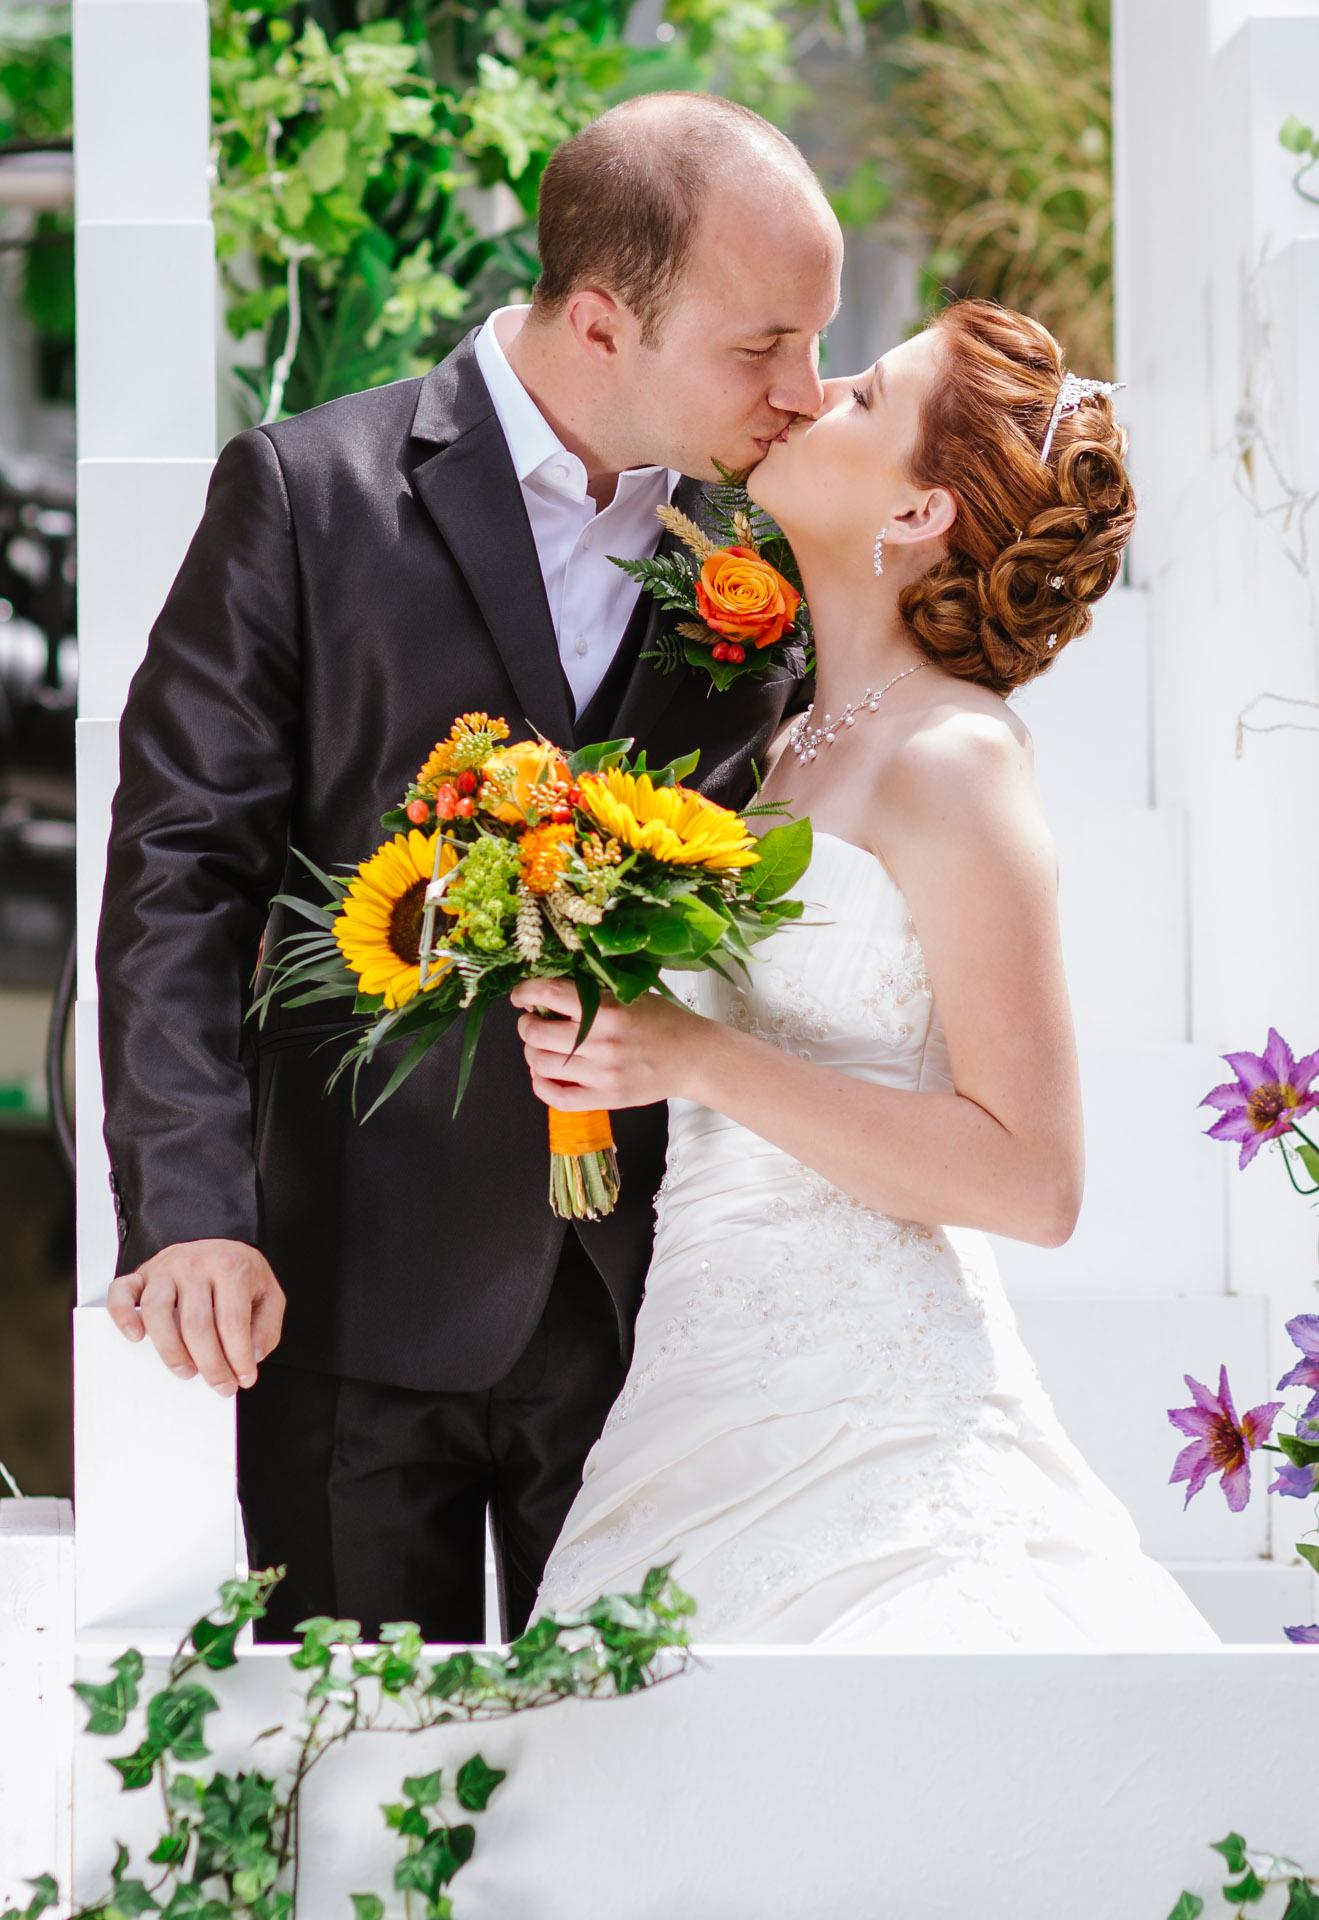 Pixelart_Hochzeitsfotografen_Loerrach_Rheinfelden_Hallwil_Schweiz_Linda-Ramon-1005